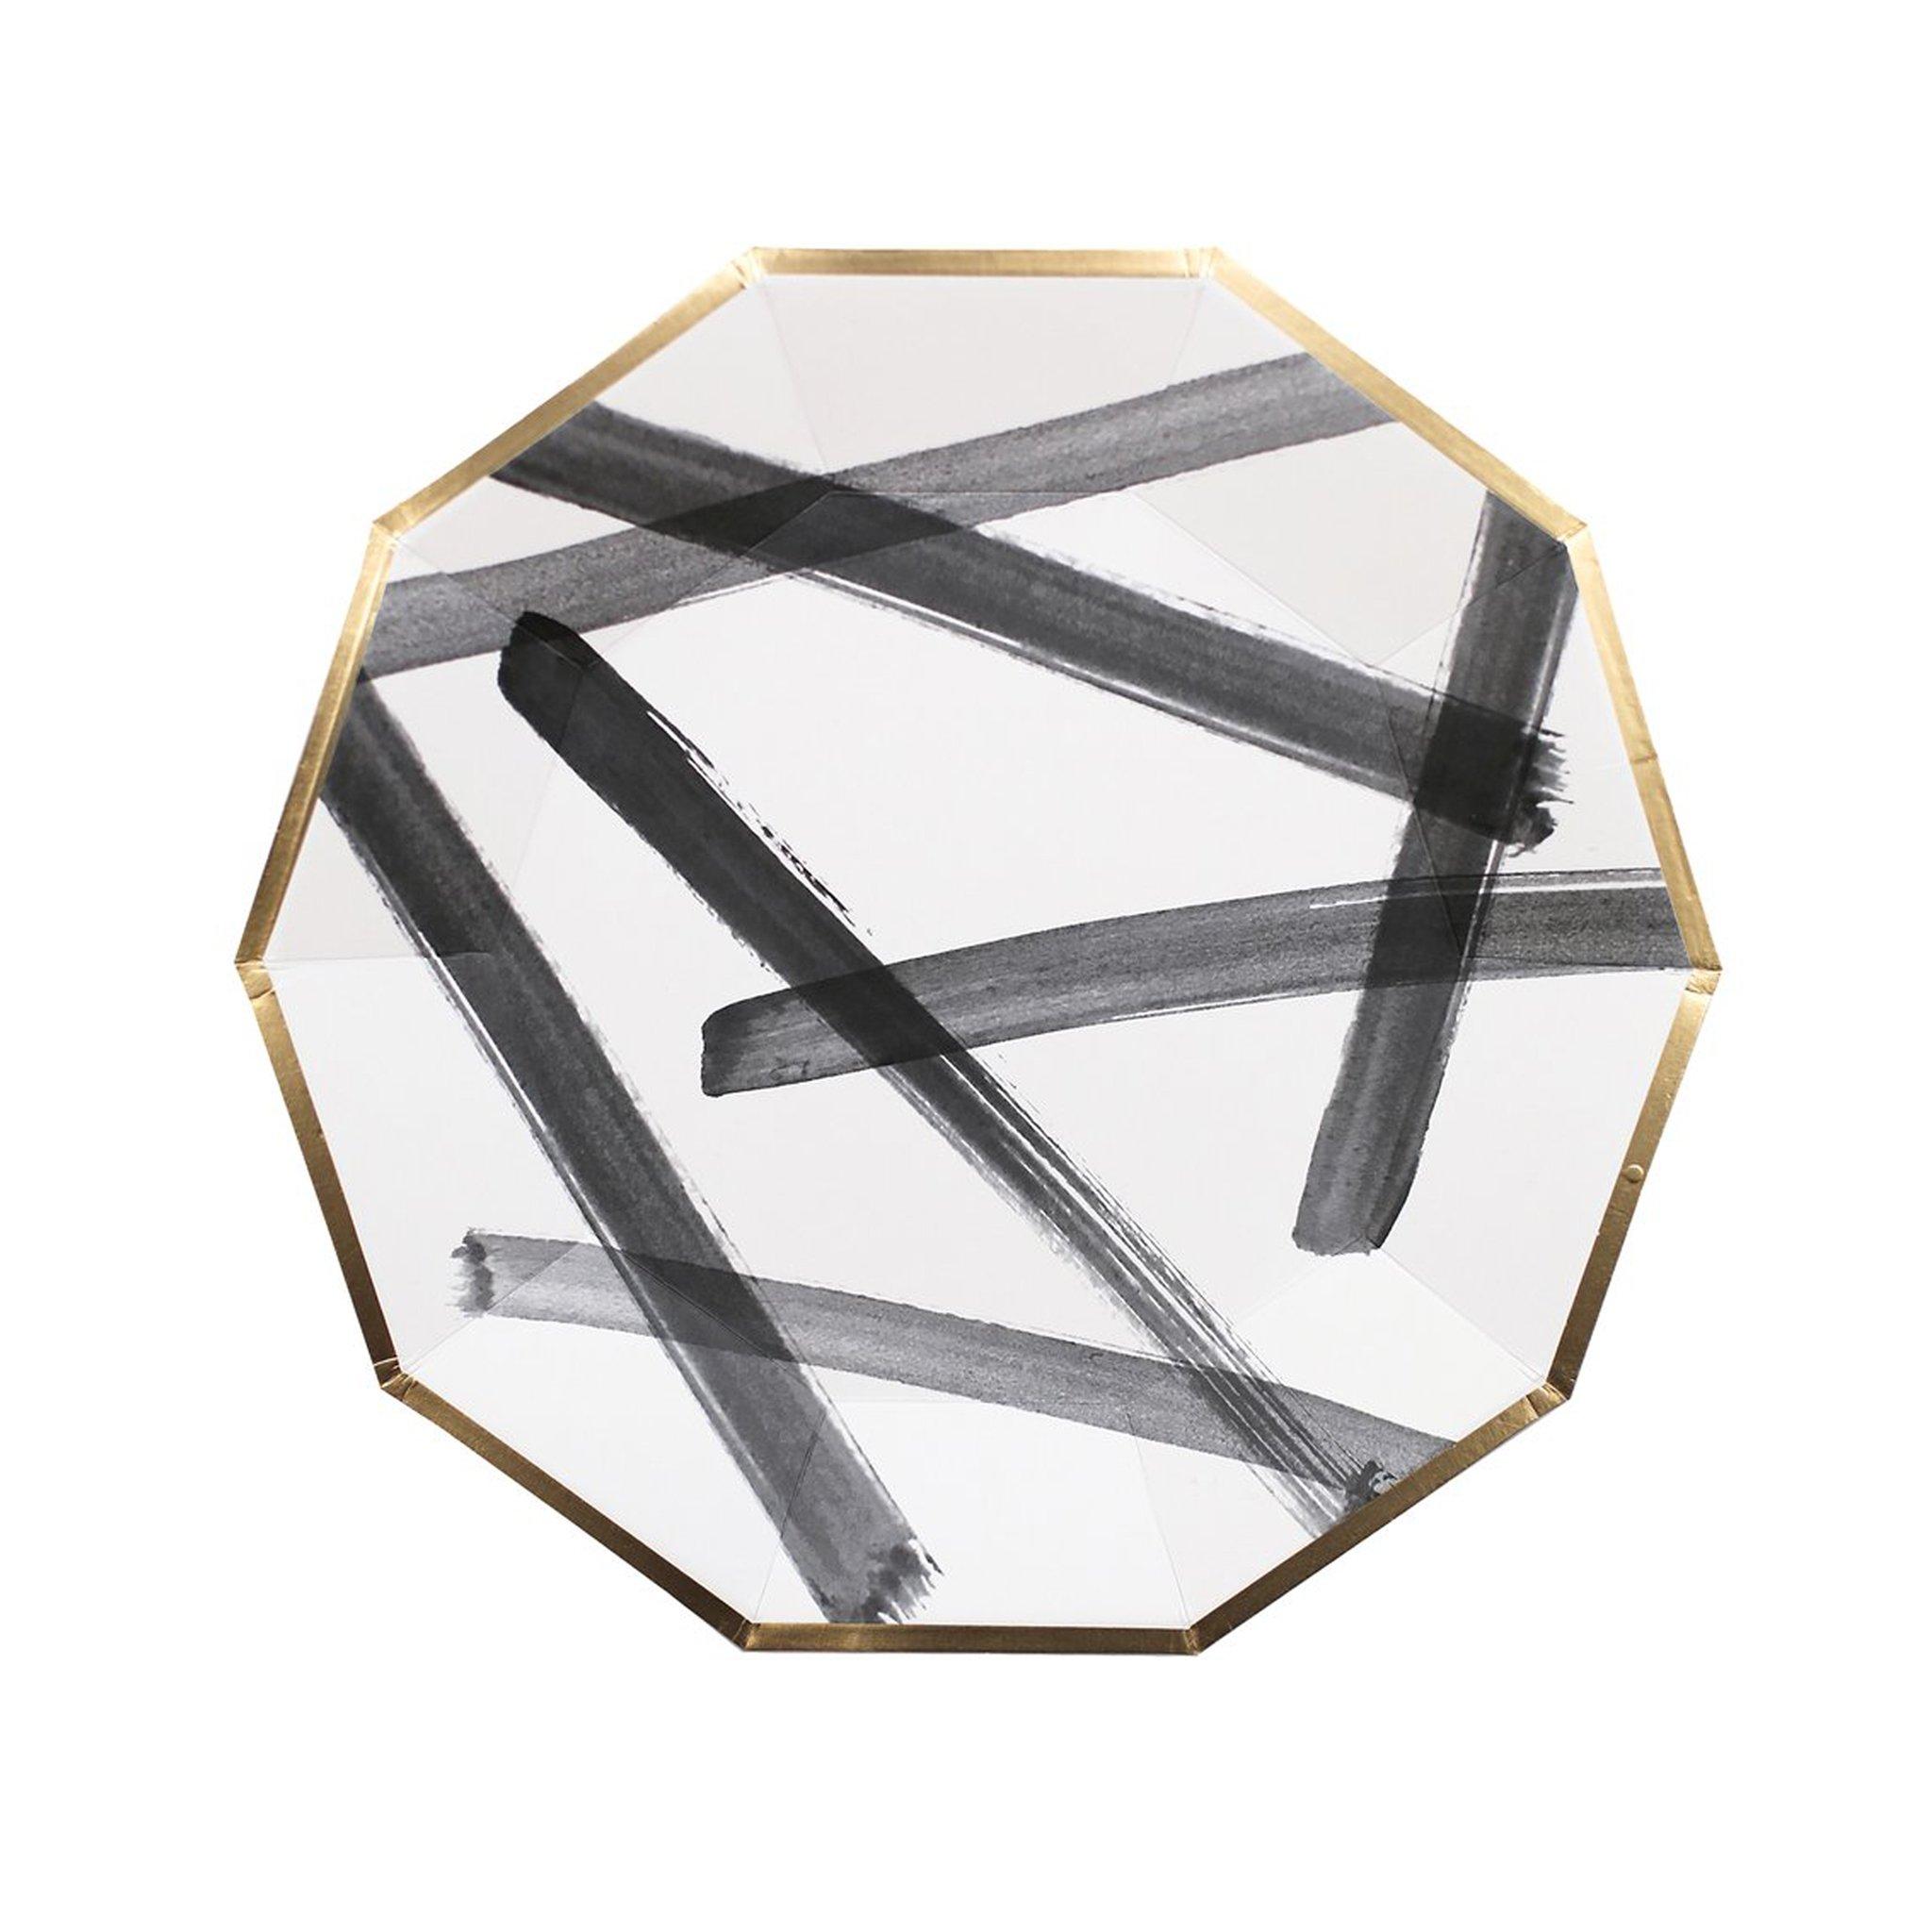 BUY ME / NEW ITEM $10.99 each Black Brush Stroke Large Paper Plates - 8 Pack